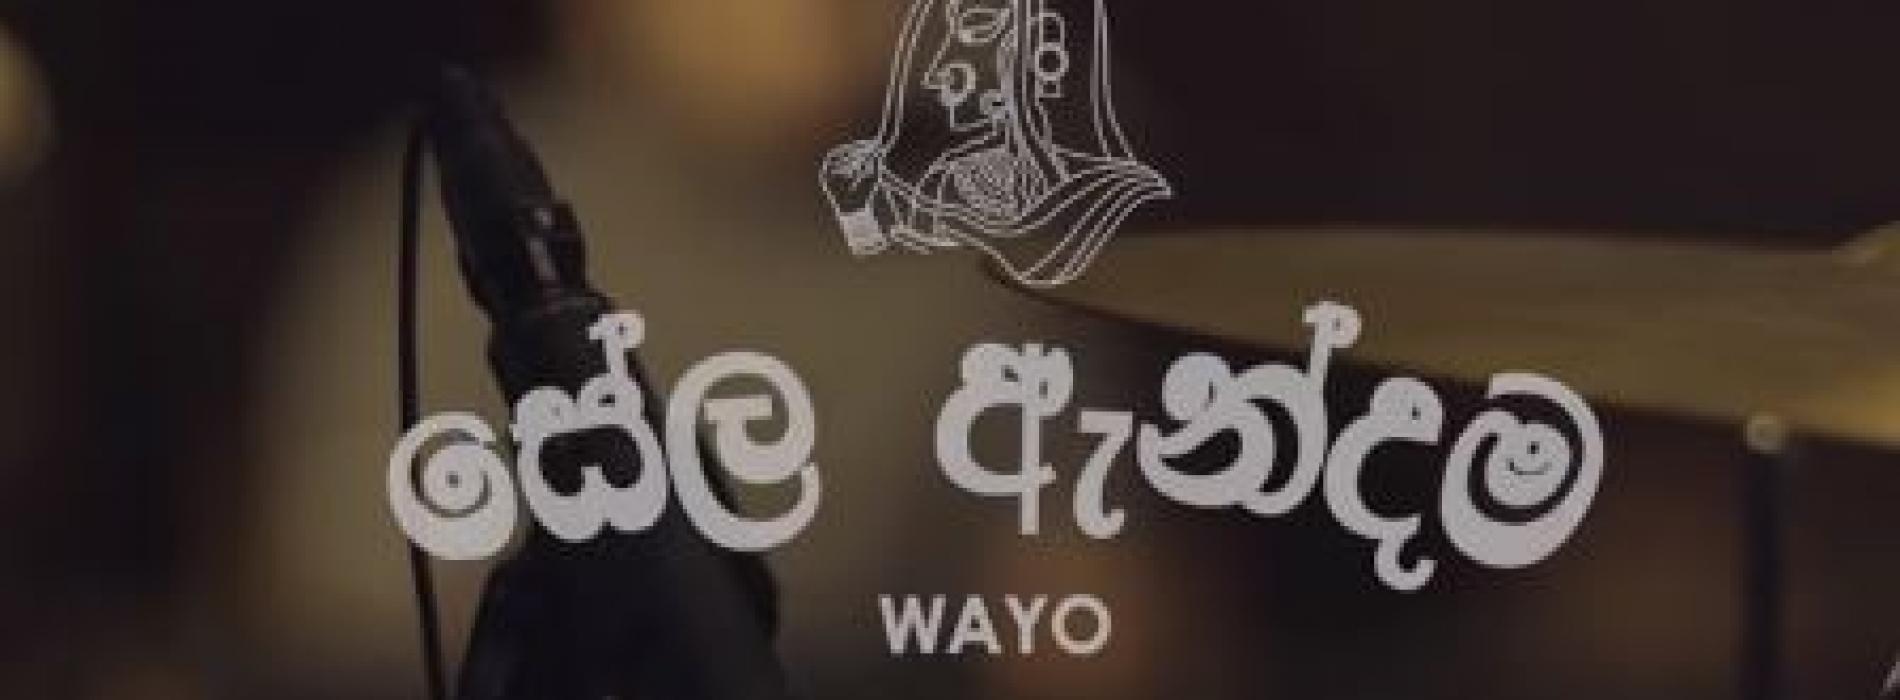 Sela Andama (සේල ඇන්දම) – WAYO Brick House Sessions (Feb 2019)